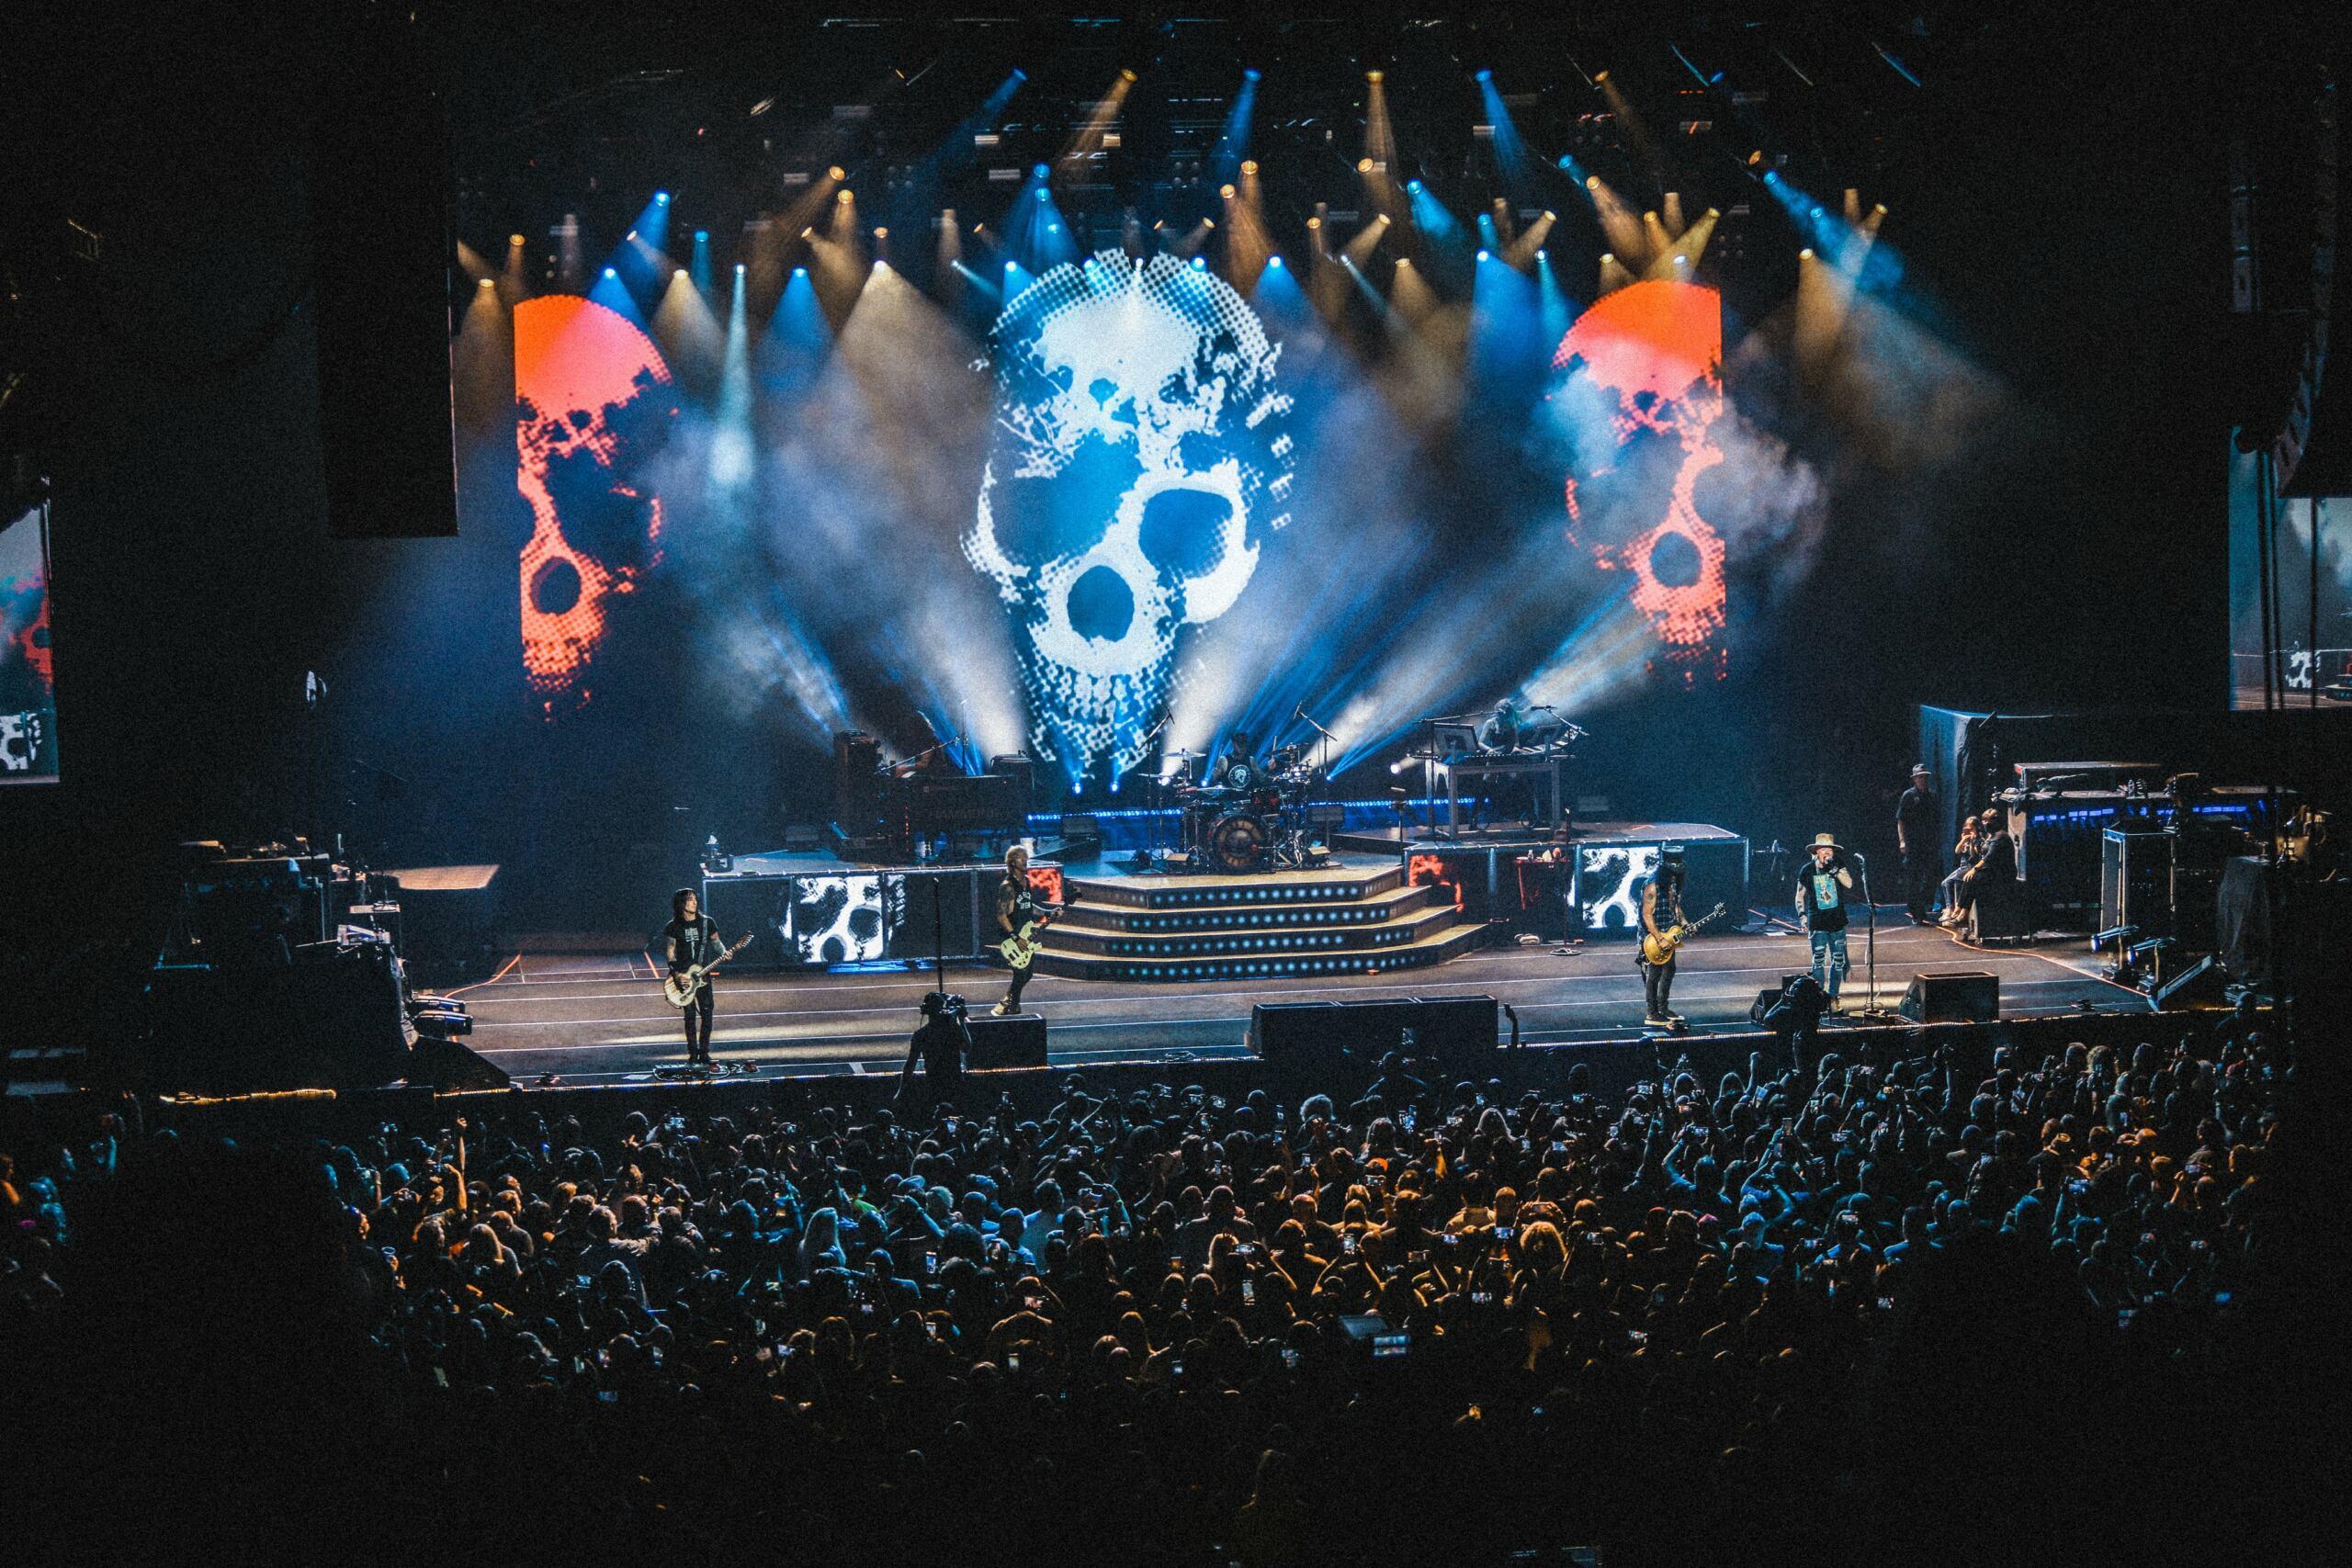 2021.09.11 - Hard Rock Live at Etess Arena, Atlantic City, NJ, USA E_r45n11